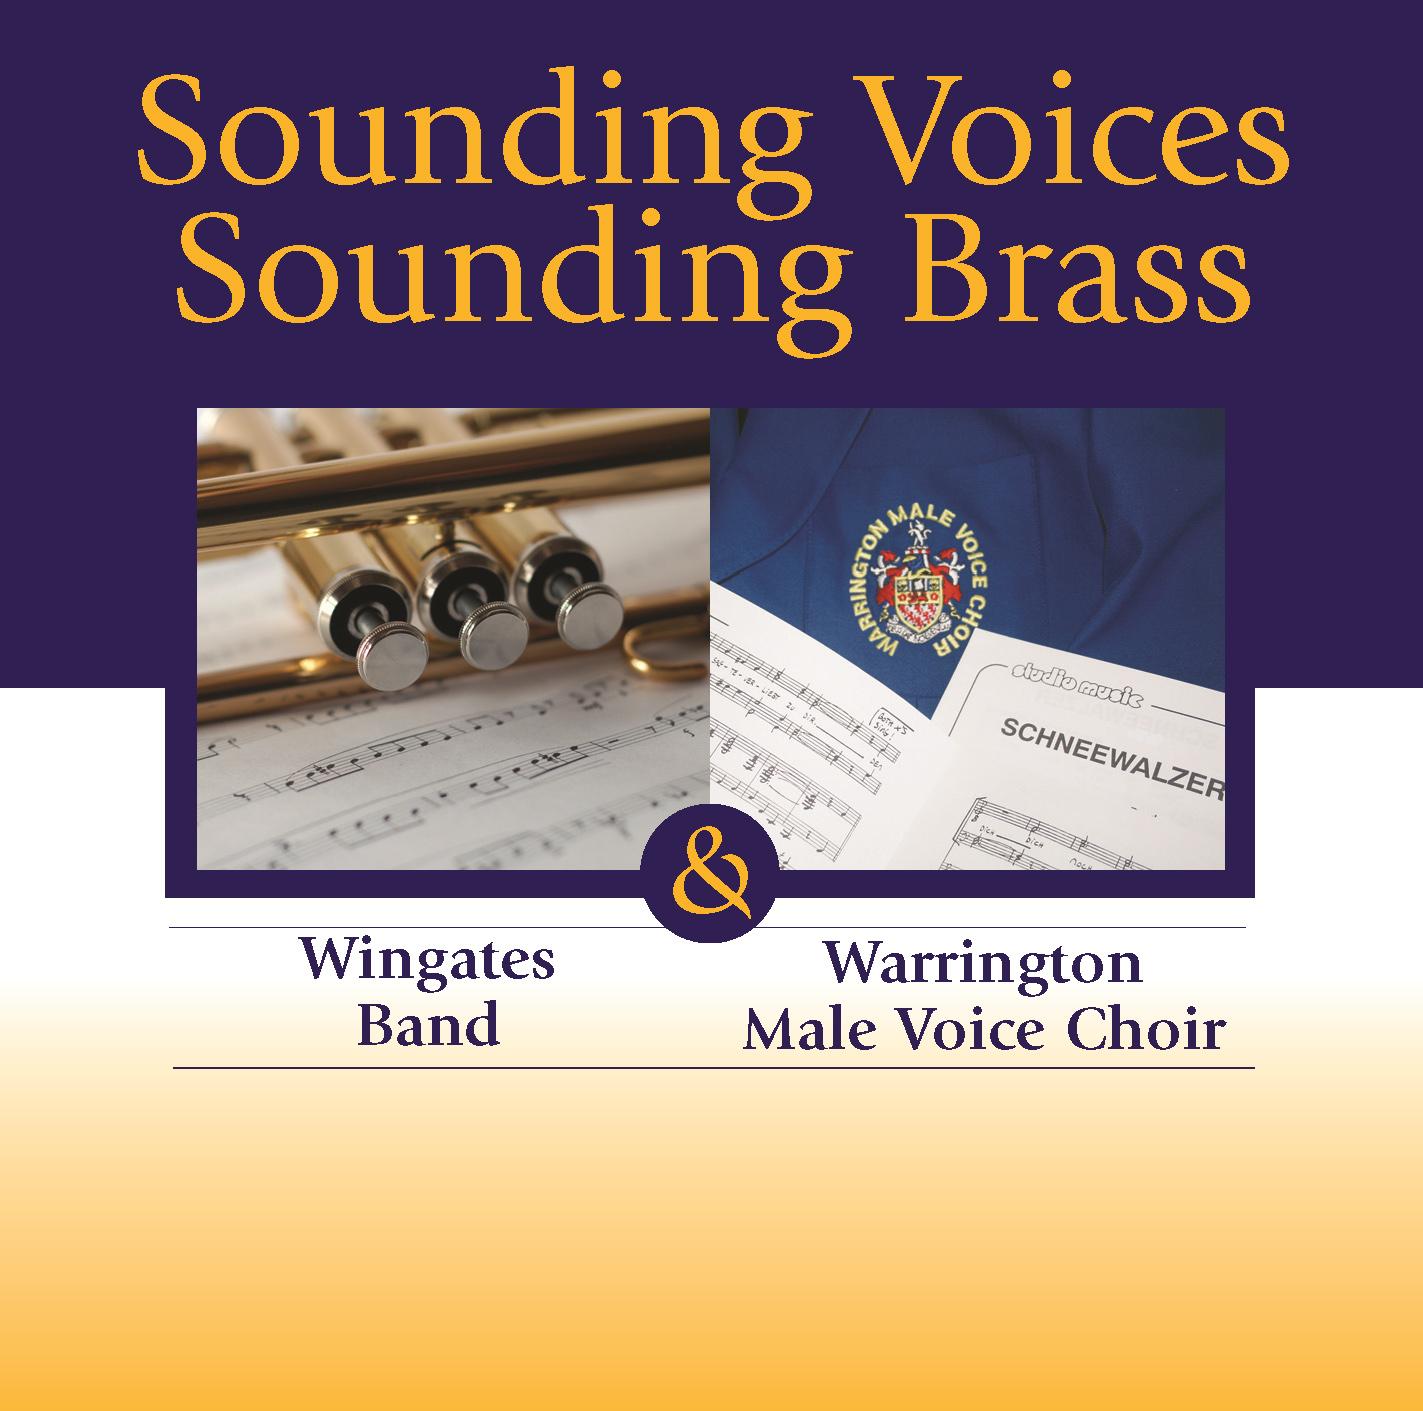 Sounding Voices, Sounding Brass